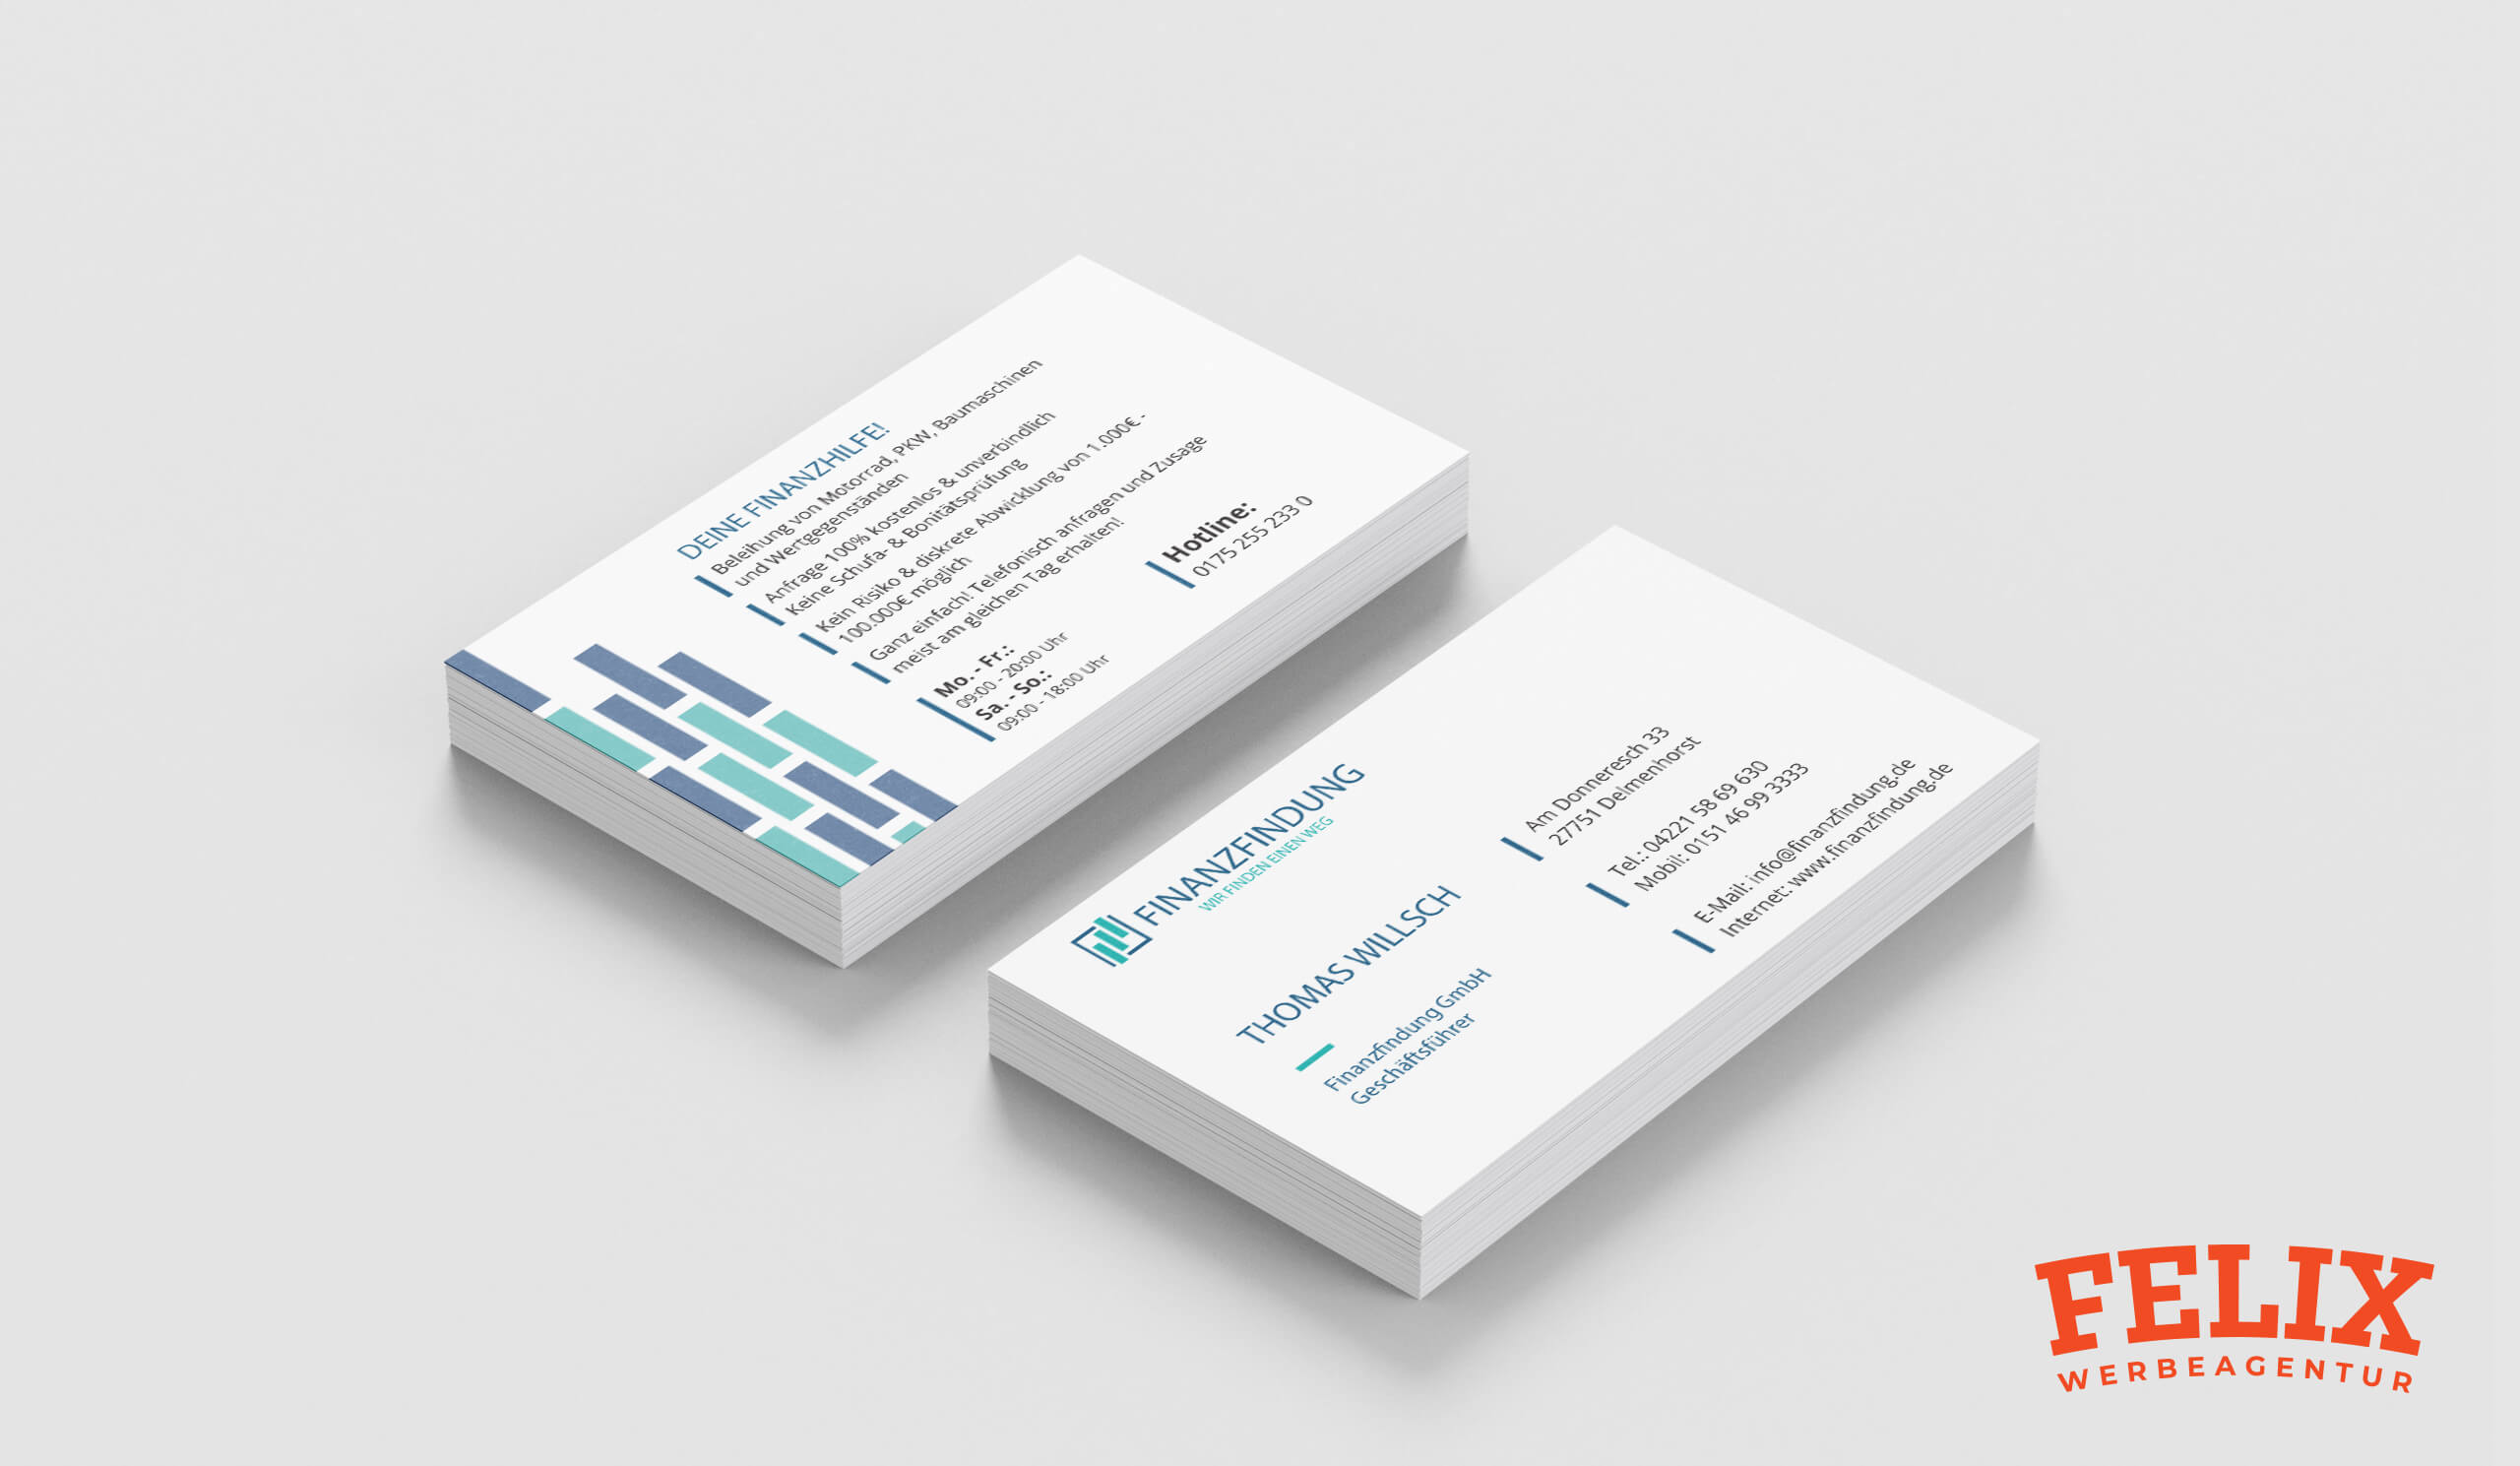 Mockup_Finanzfindung GmbH_Visitenkarte